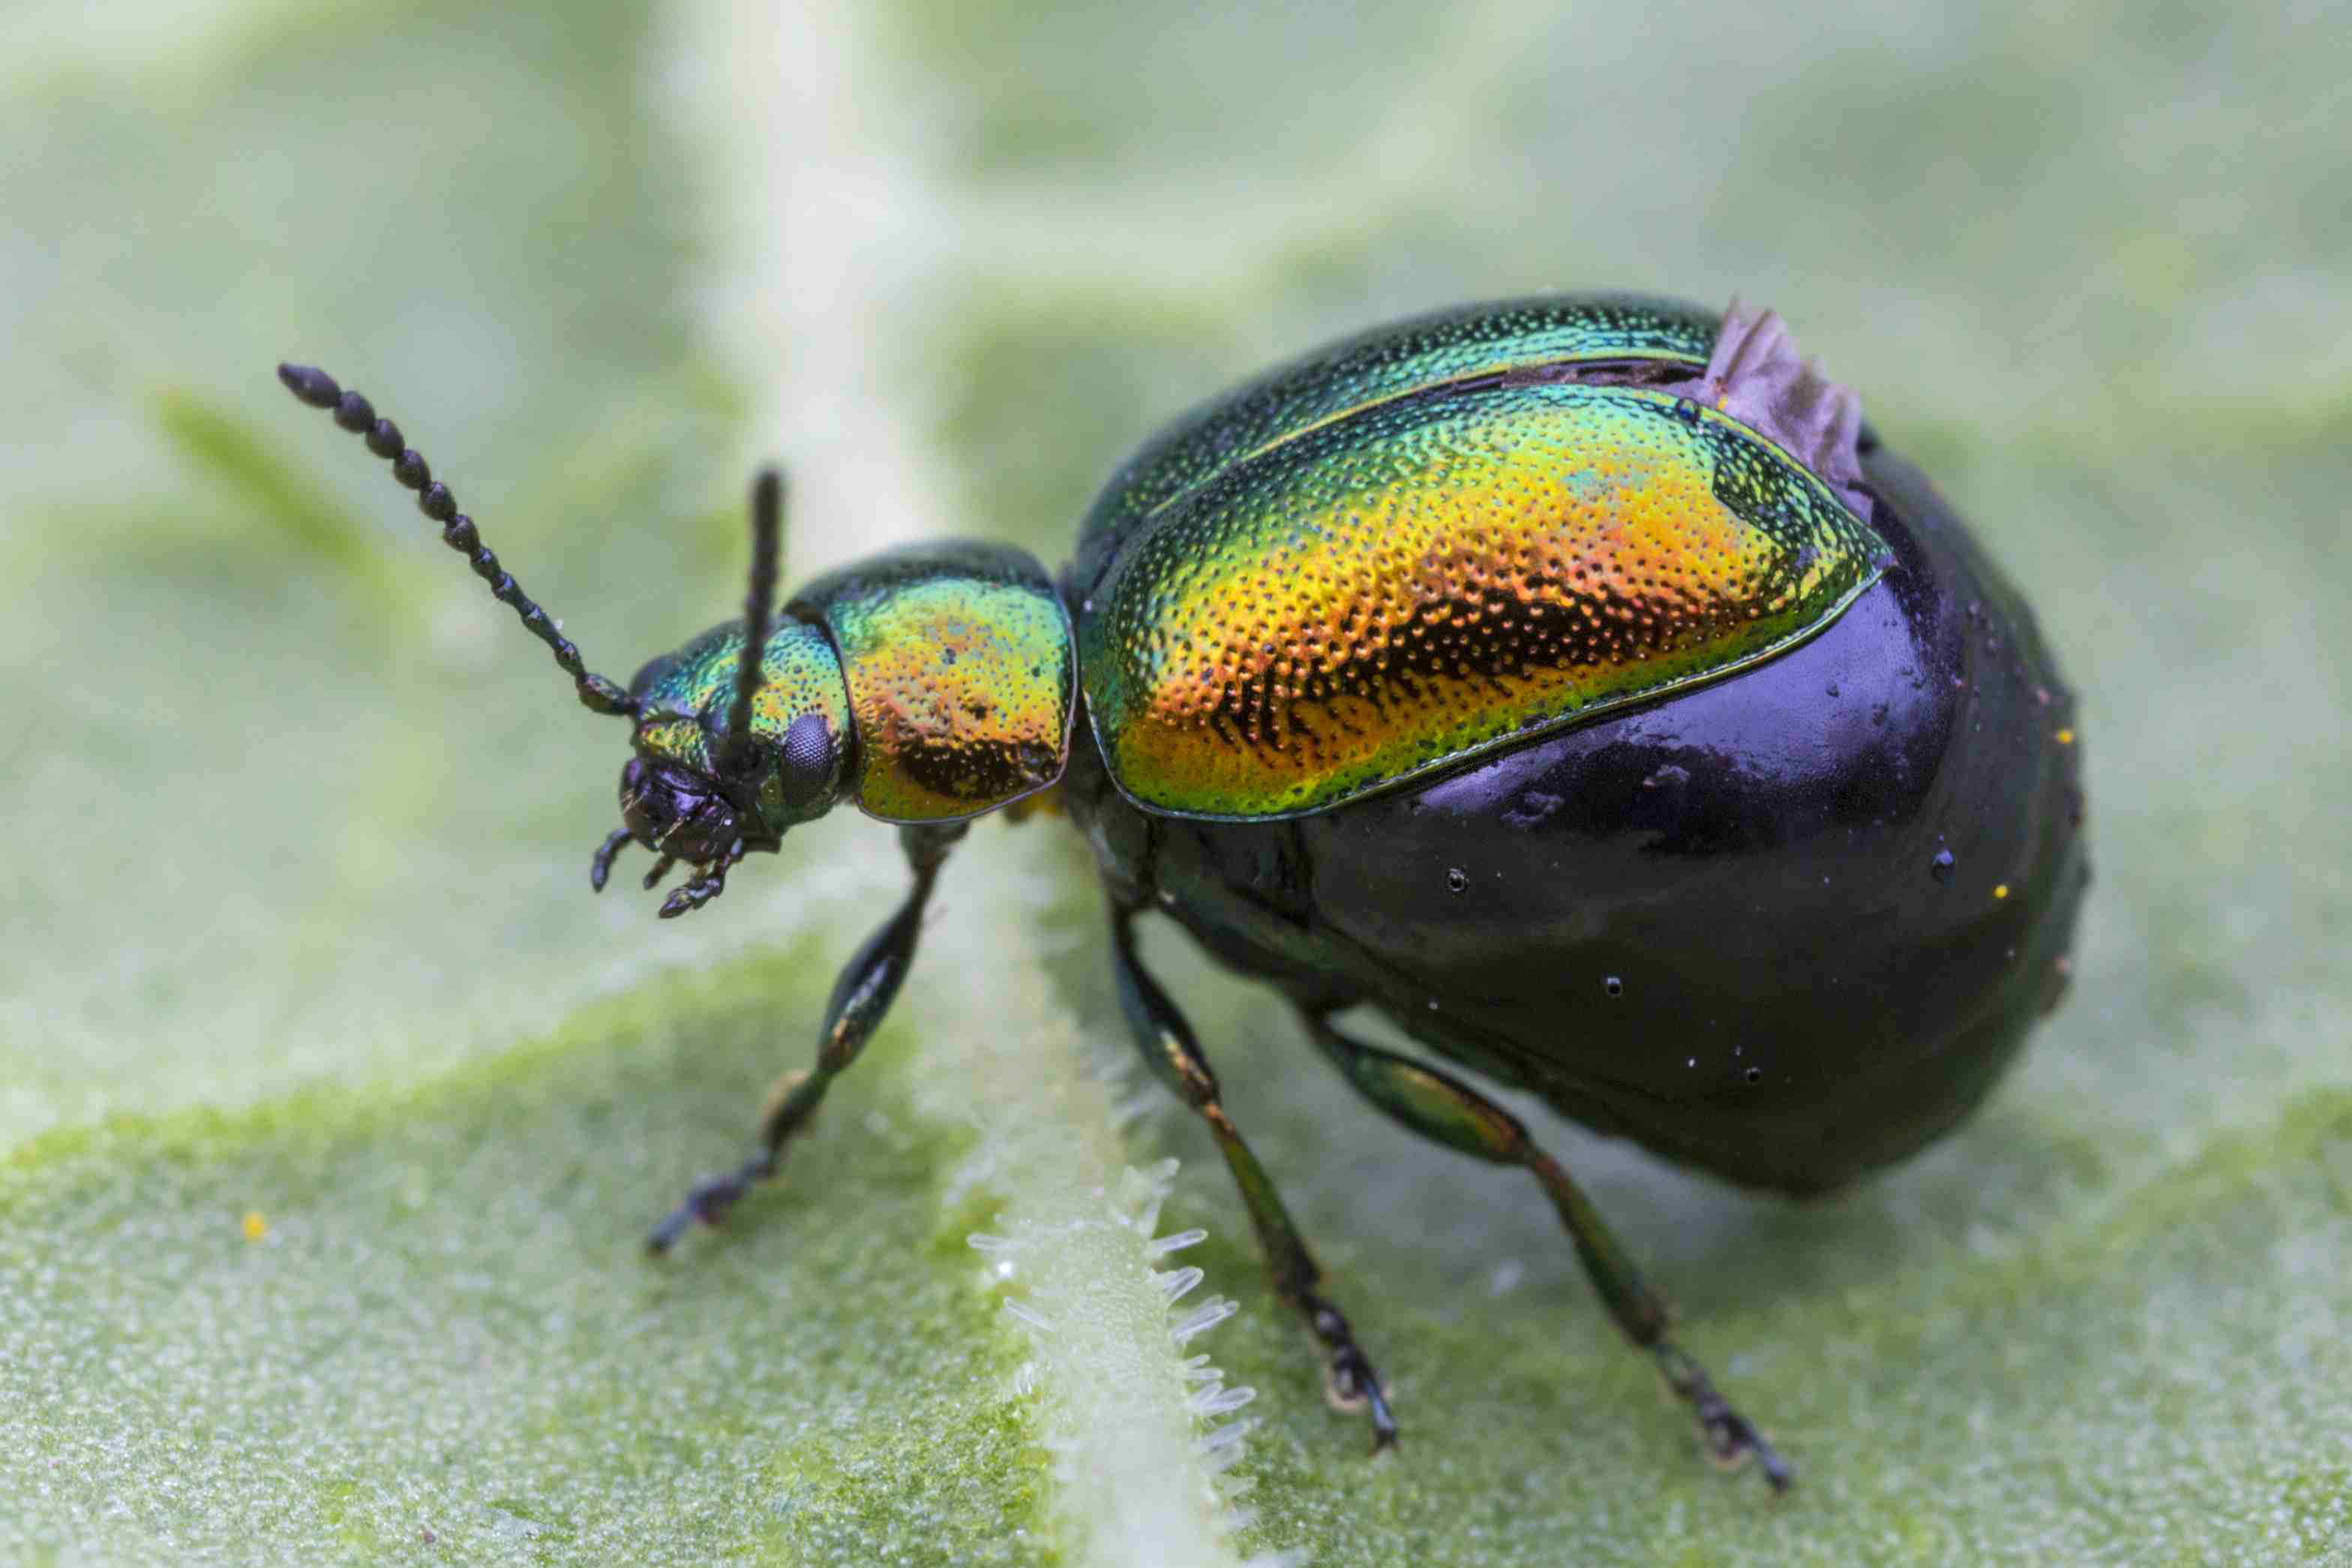 European green dock beetle (<i>Gastrophysa viridula</i>) with a swollen abdomen filled with eggs